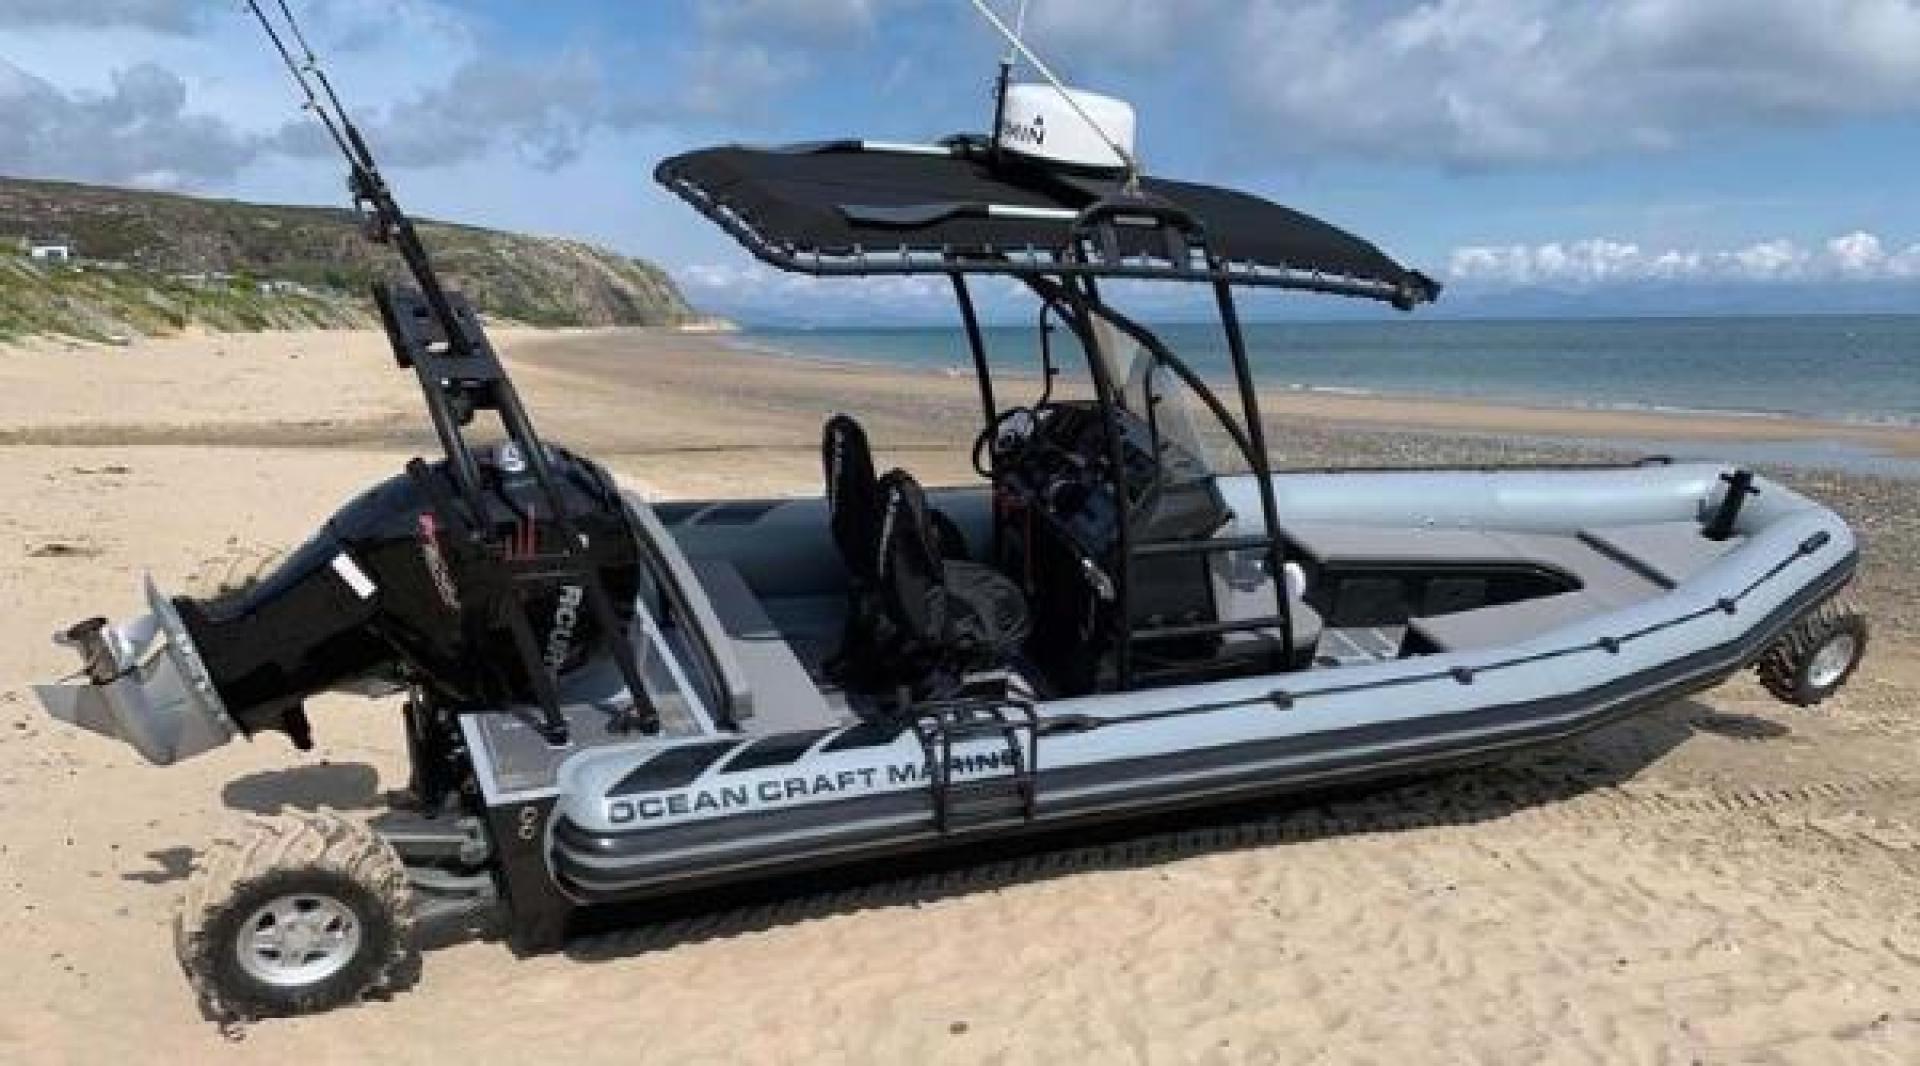 Ocean Craft Marine-8.4 M Amphibious 2020-Ocean Craft Marine 8.4 M Amphibious Fort Lauderdale-Florida-United States-1523045 | Thumbnail